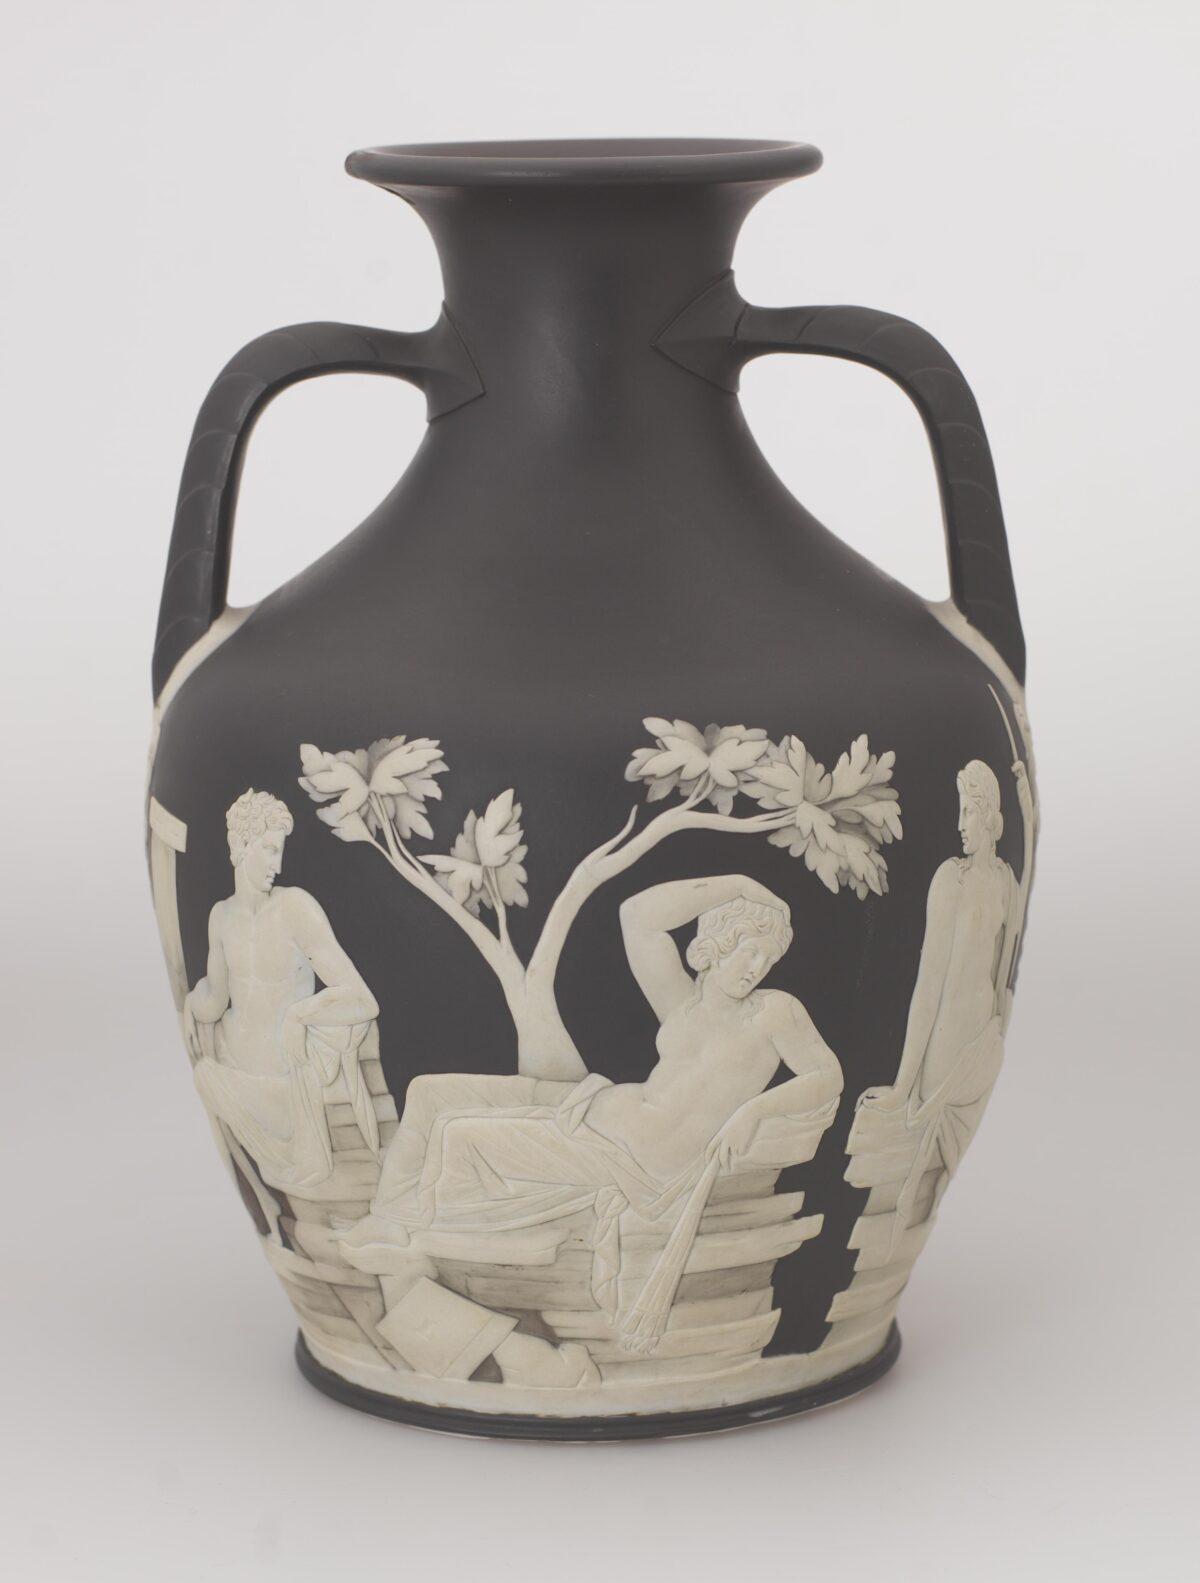 Josiah Wedgwood S Portland Vase The Pinnacle Of Classical